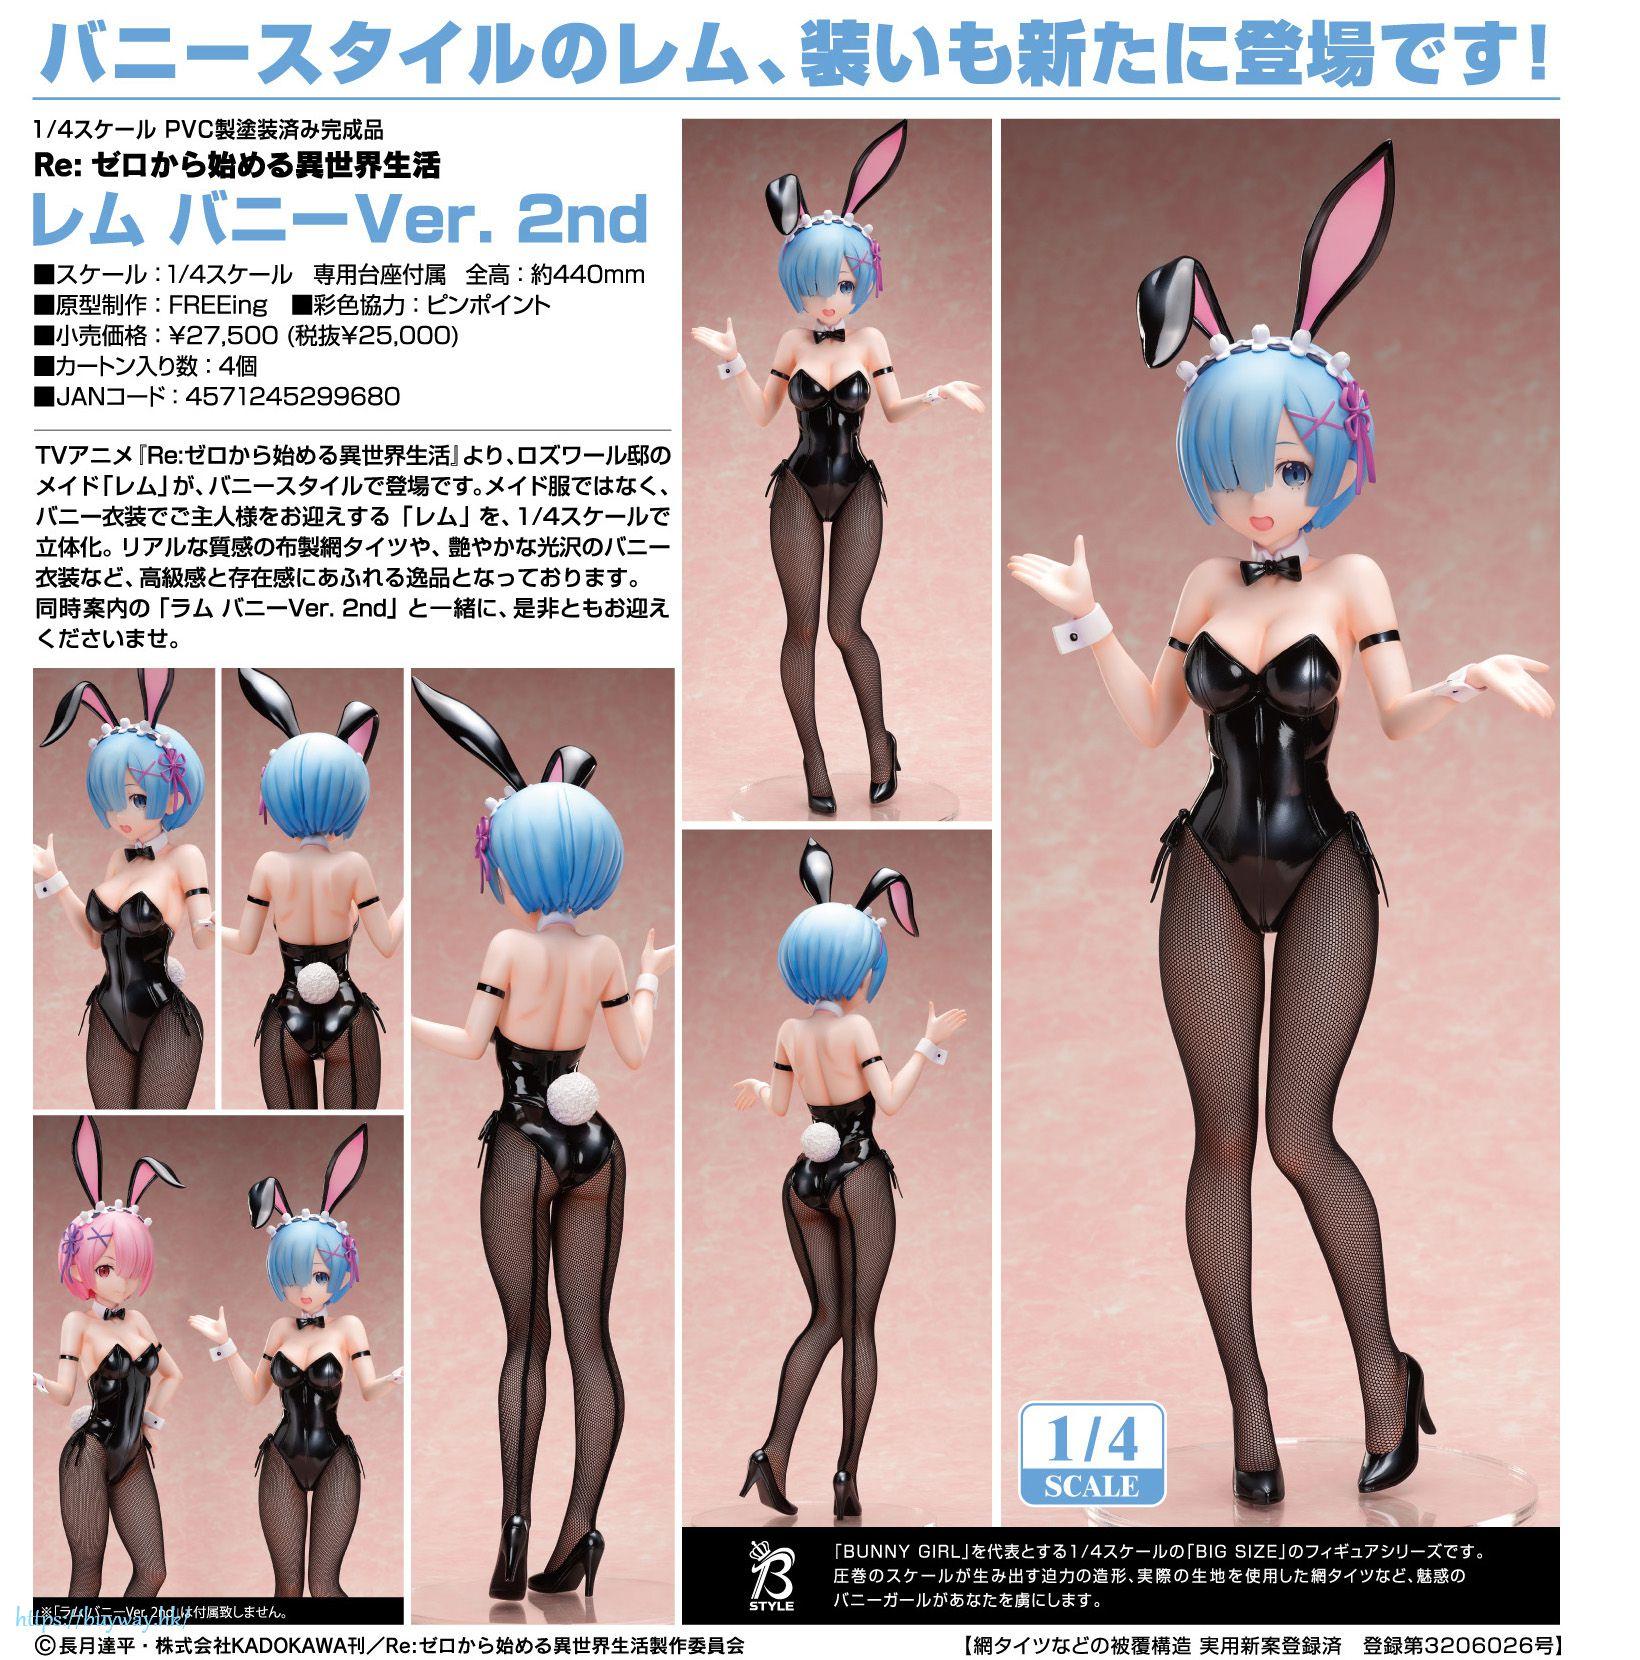 Re:從零開始的異世界生活 B-STYLE 1/4「雷姆」Bunny Ver. 2nd B-STYLE 1/4 Rem Bunny Ver. 2nd【Re:Zero】